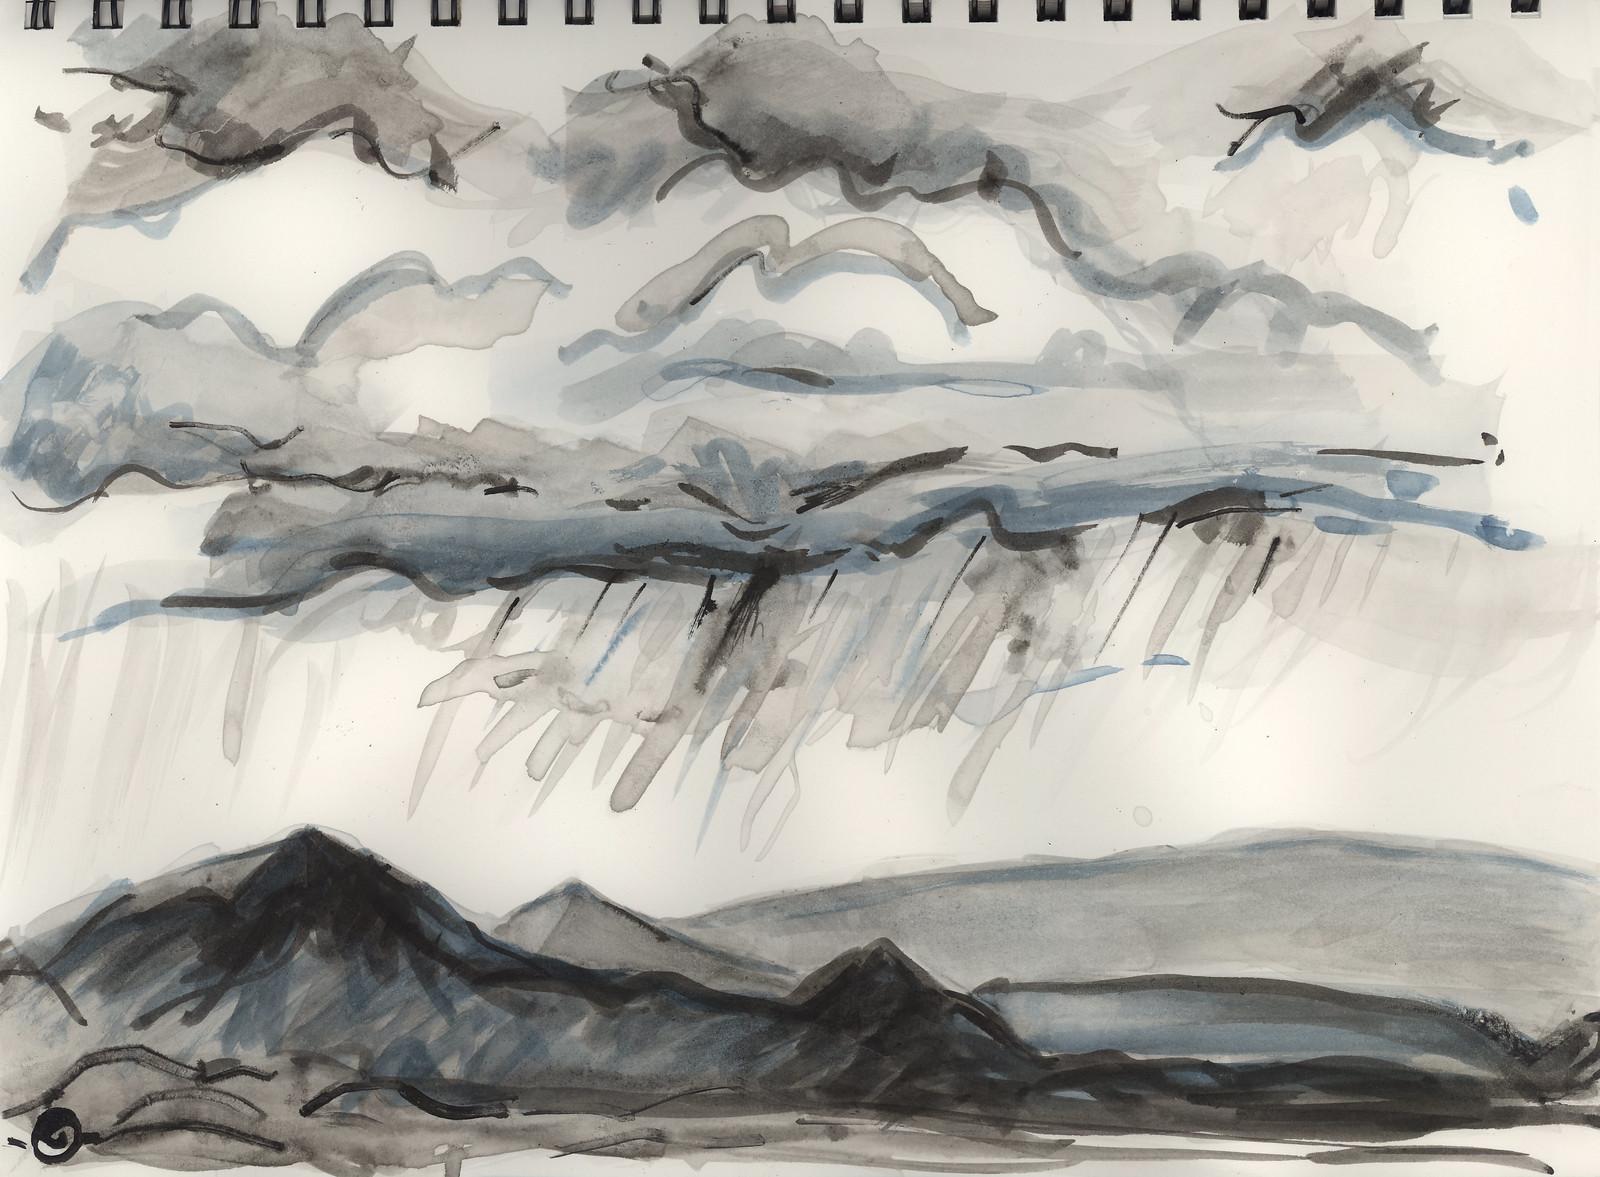 Rain, Jemez Mountains